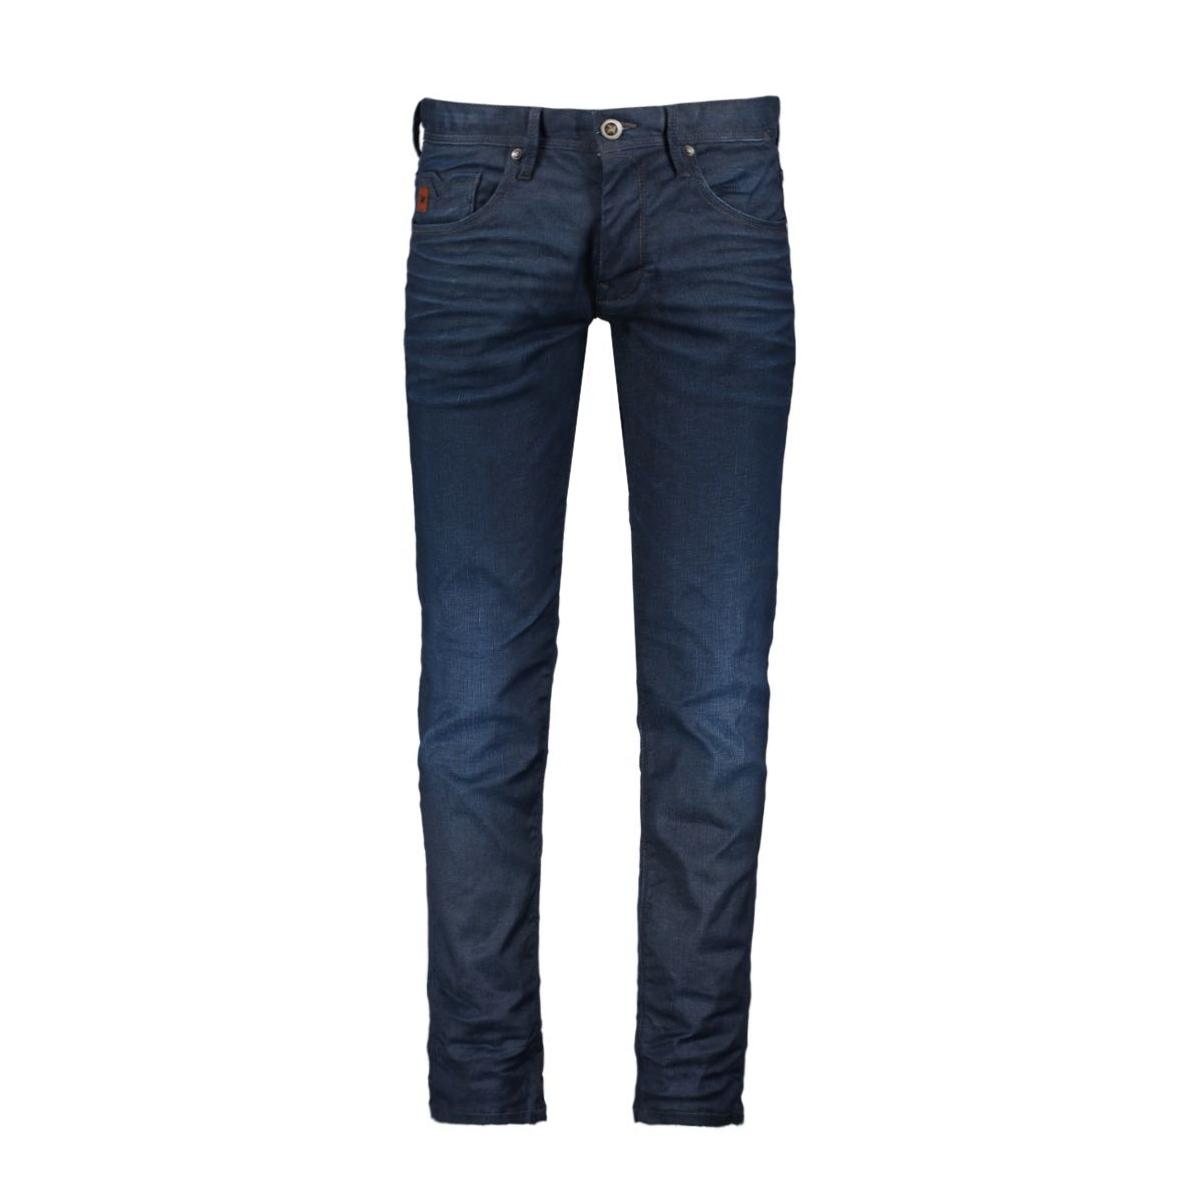 vtr515 v7 rider vanguard jeans csb